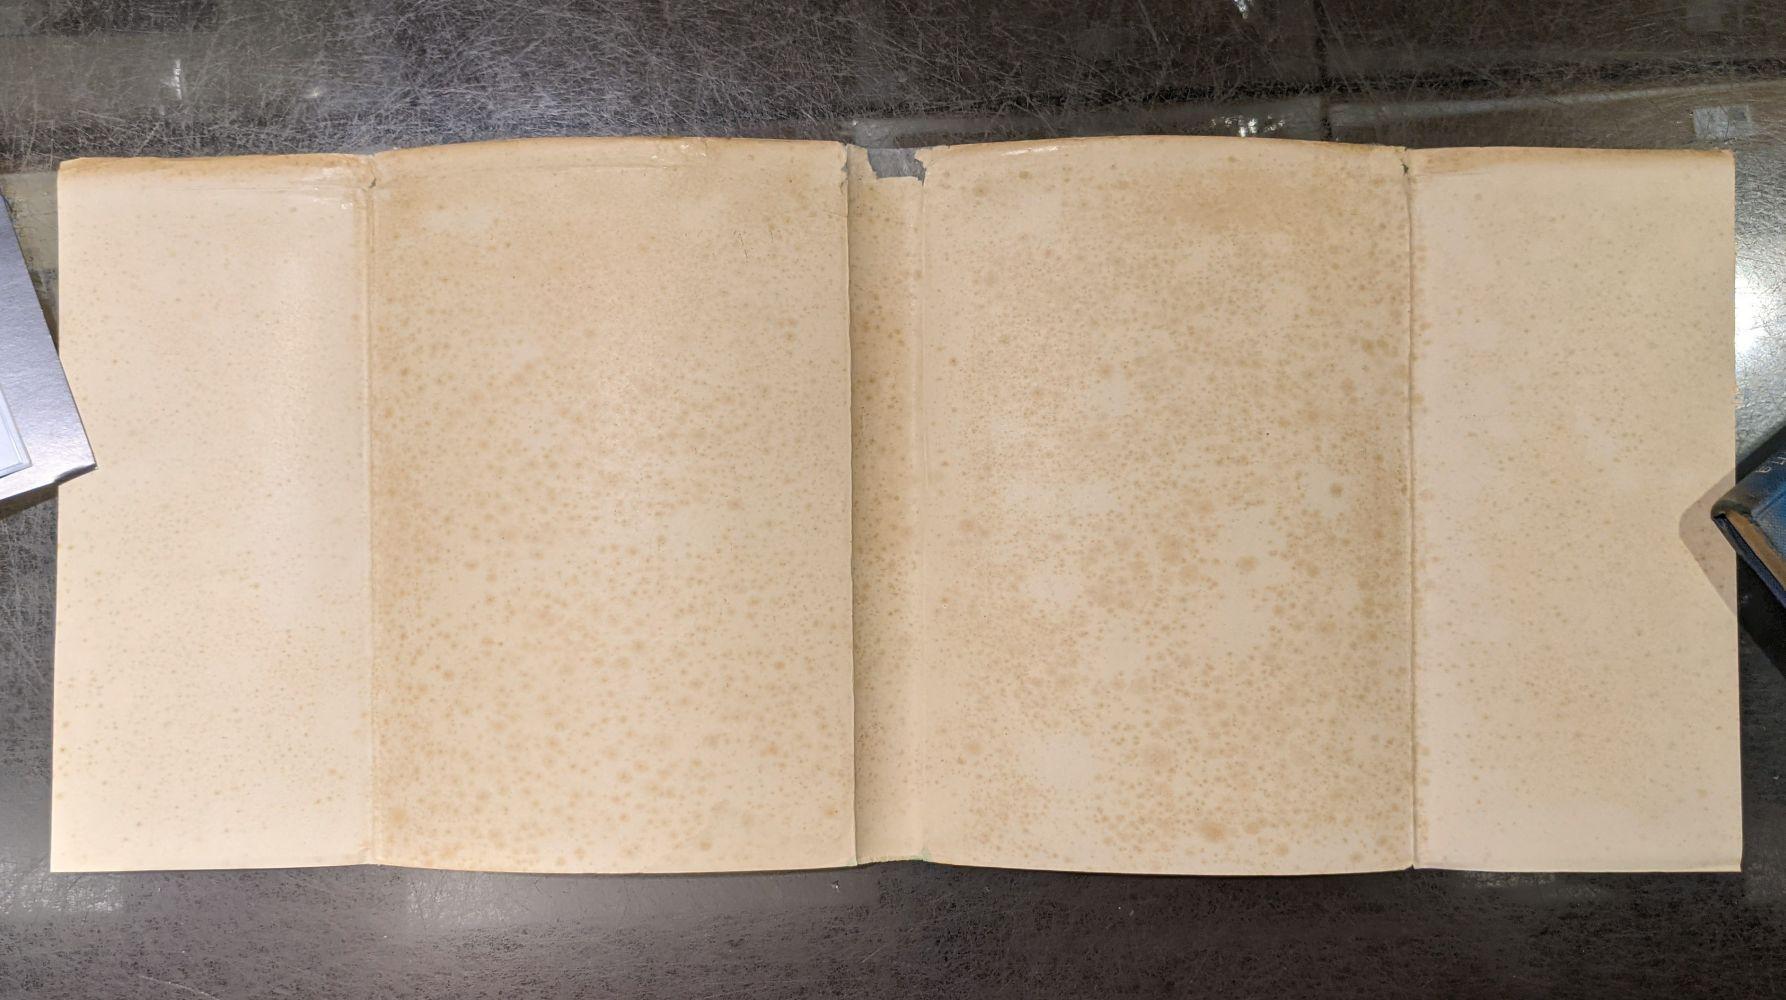 Lewis (C.S.) The Last Battle, 1st edition, 1956 - Image 2 of 9